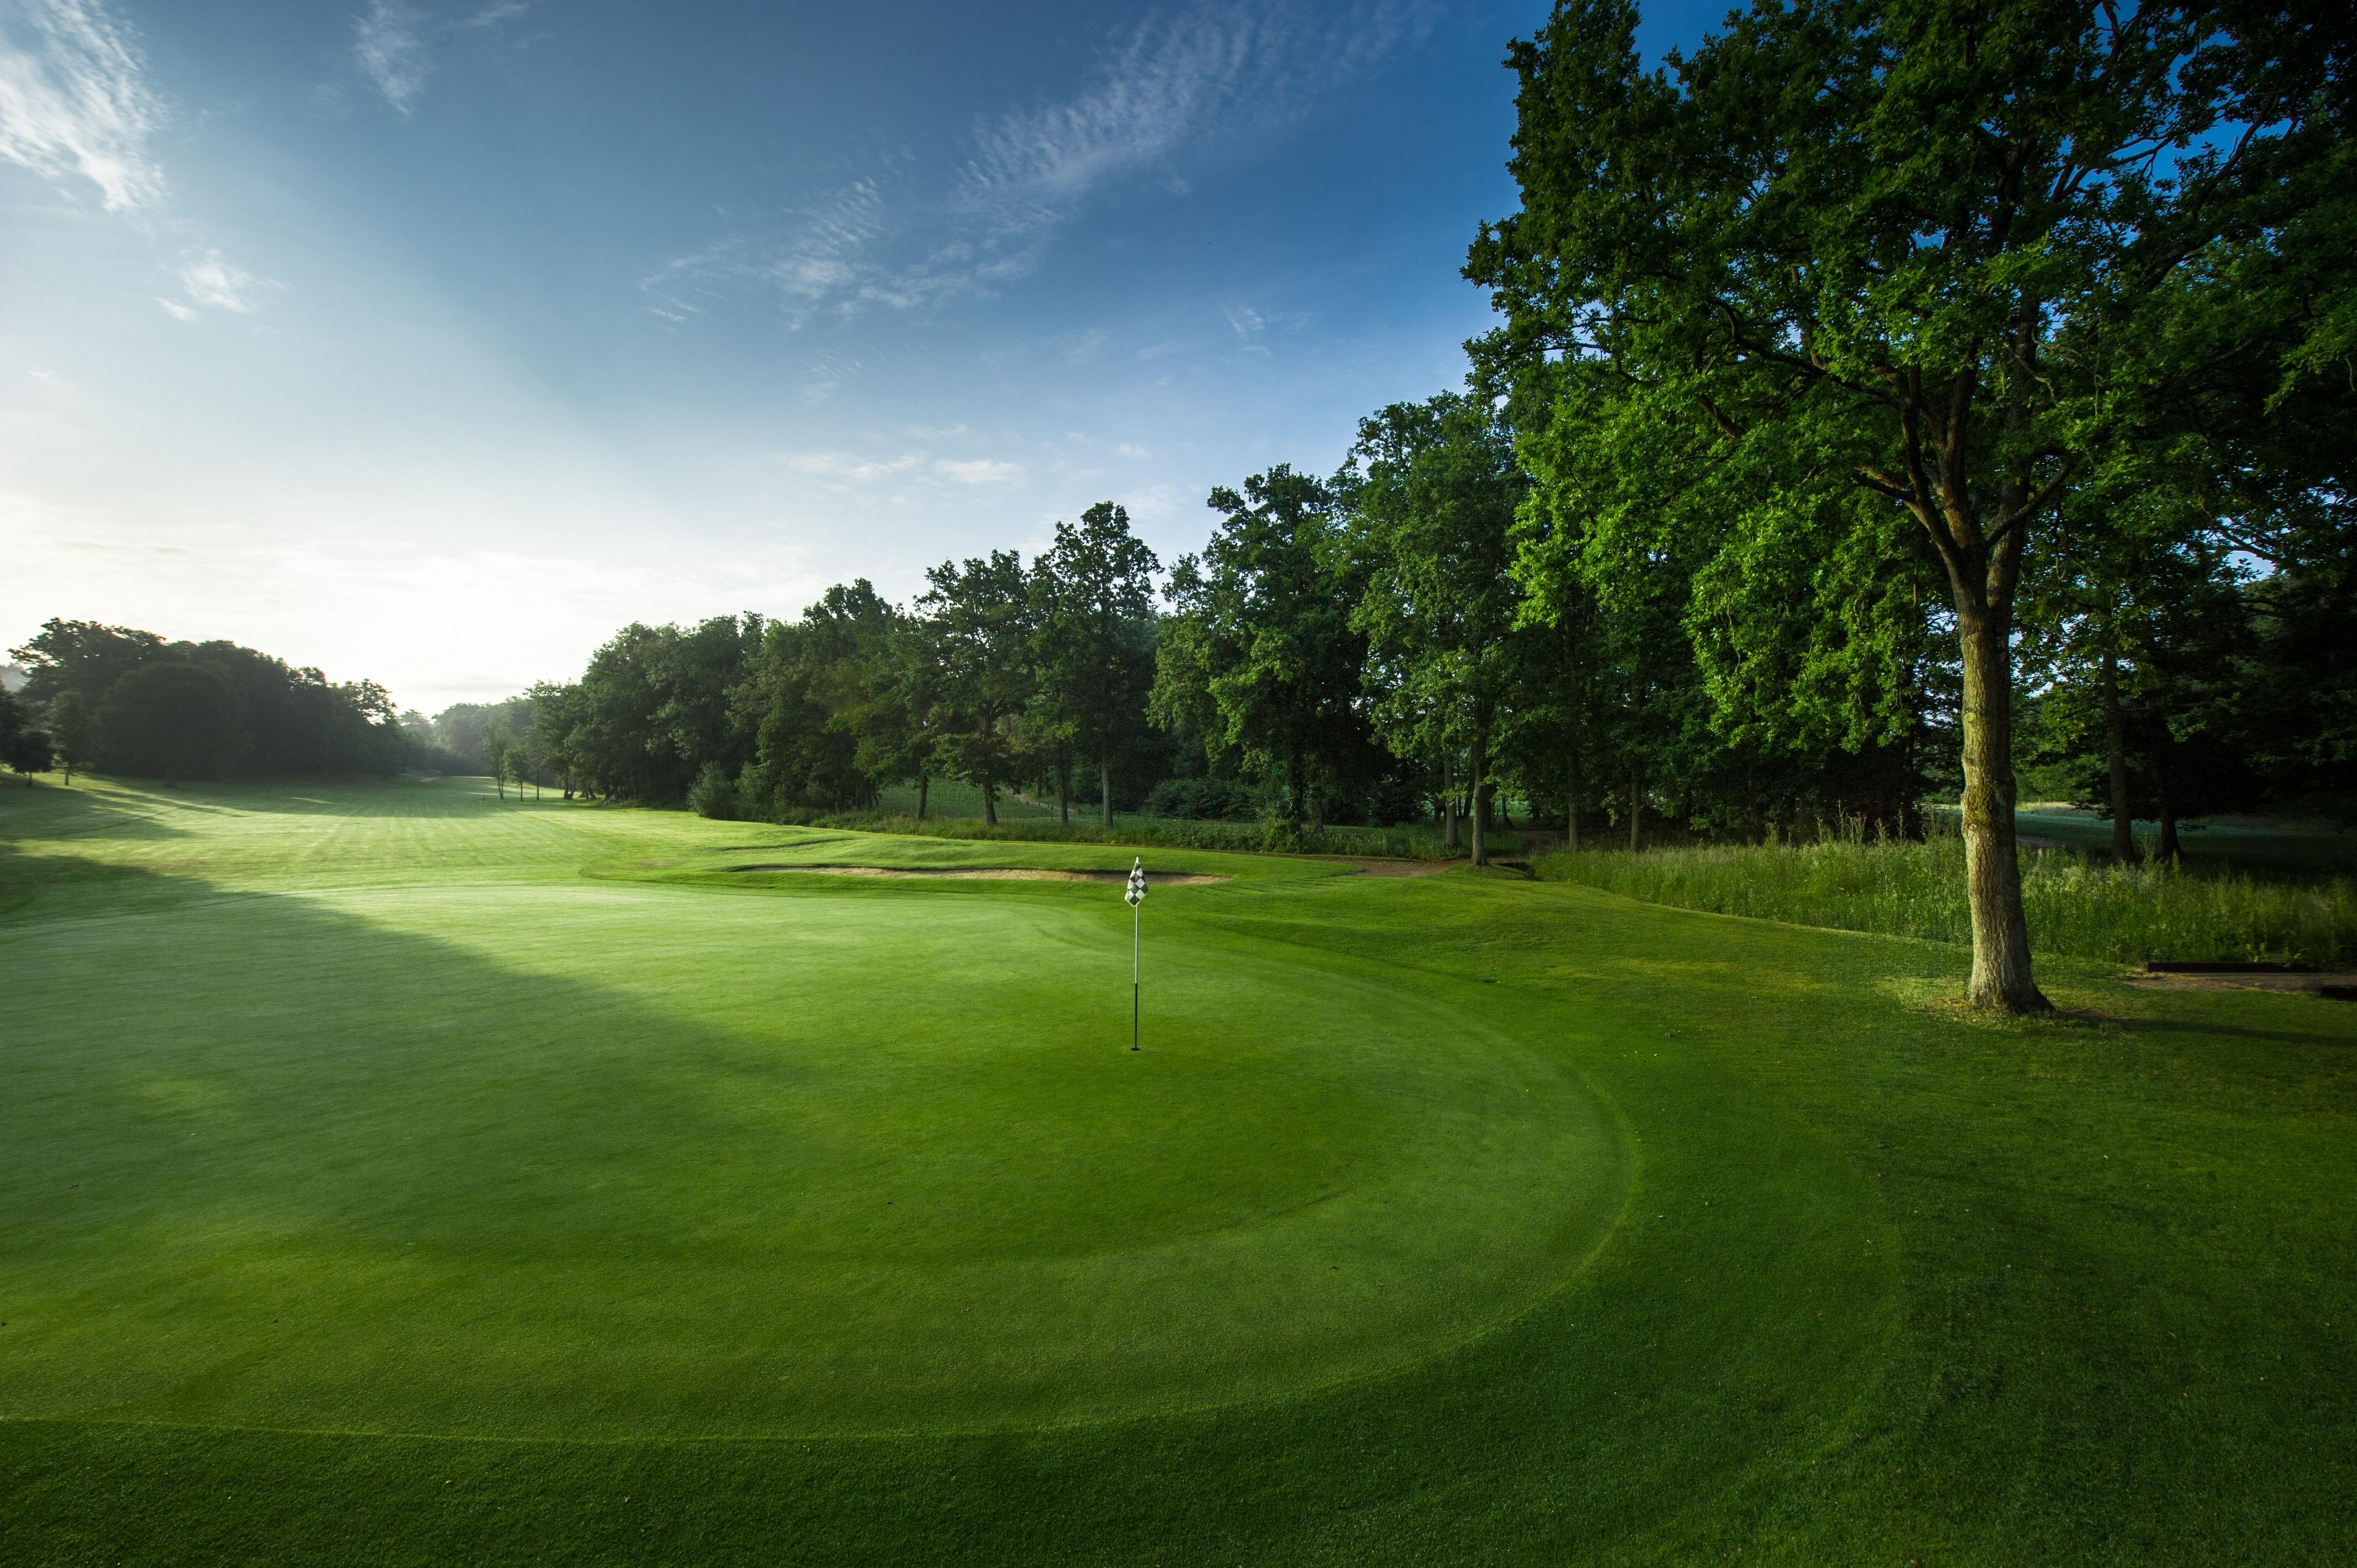 developers Peter McEvoy golf operators golf media golf wallpaper 4256x2832